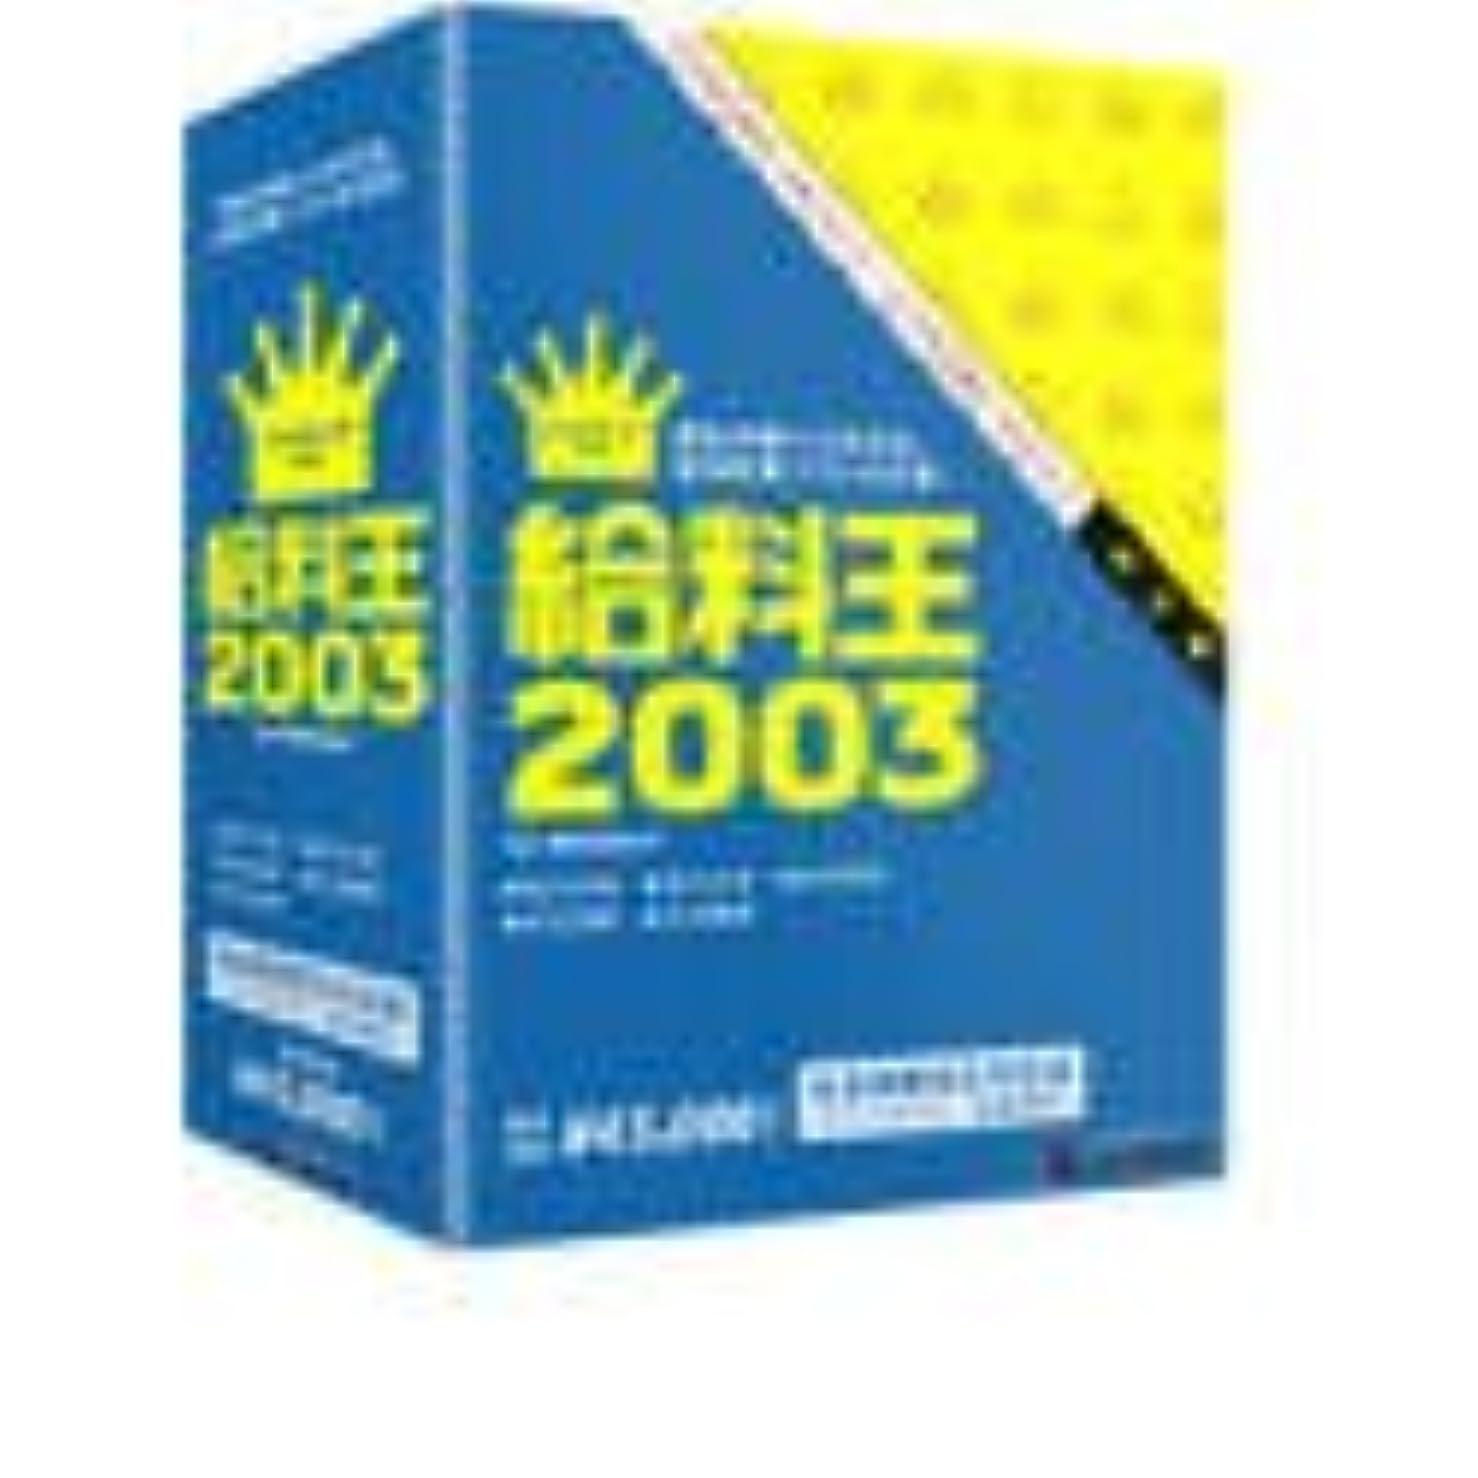 給料王 2003